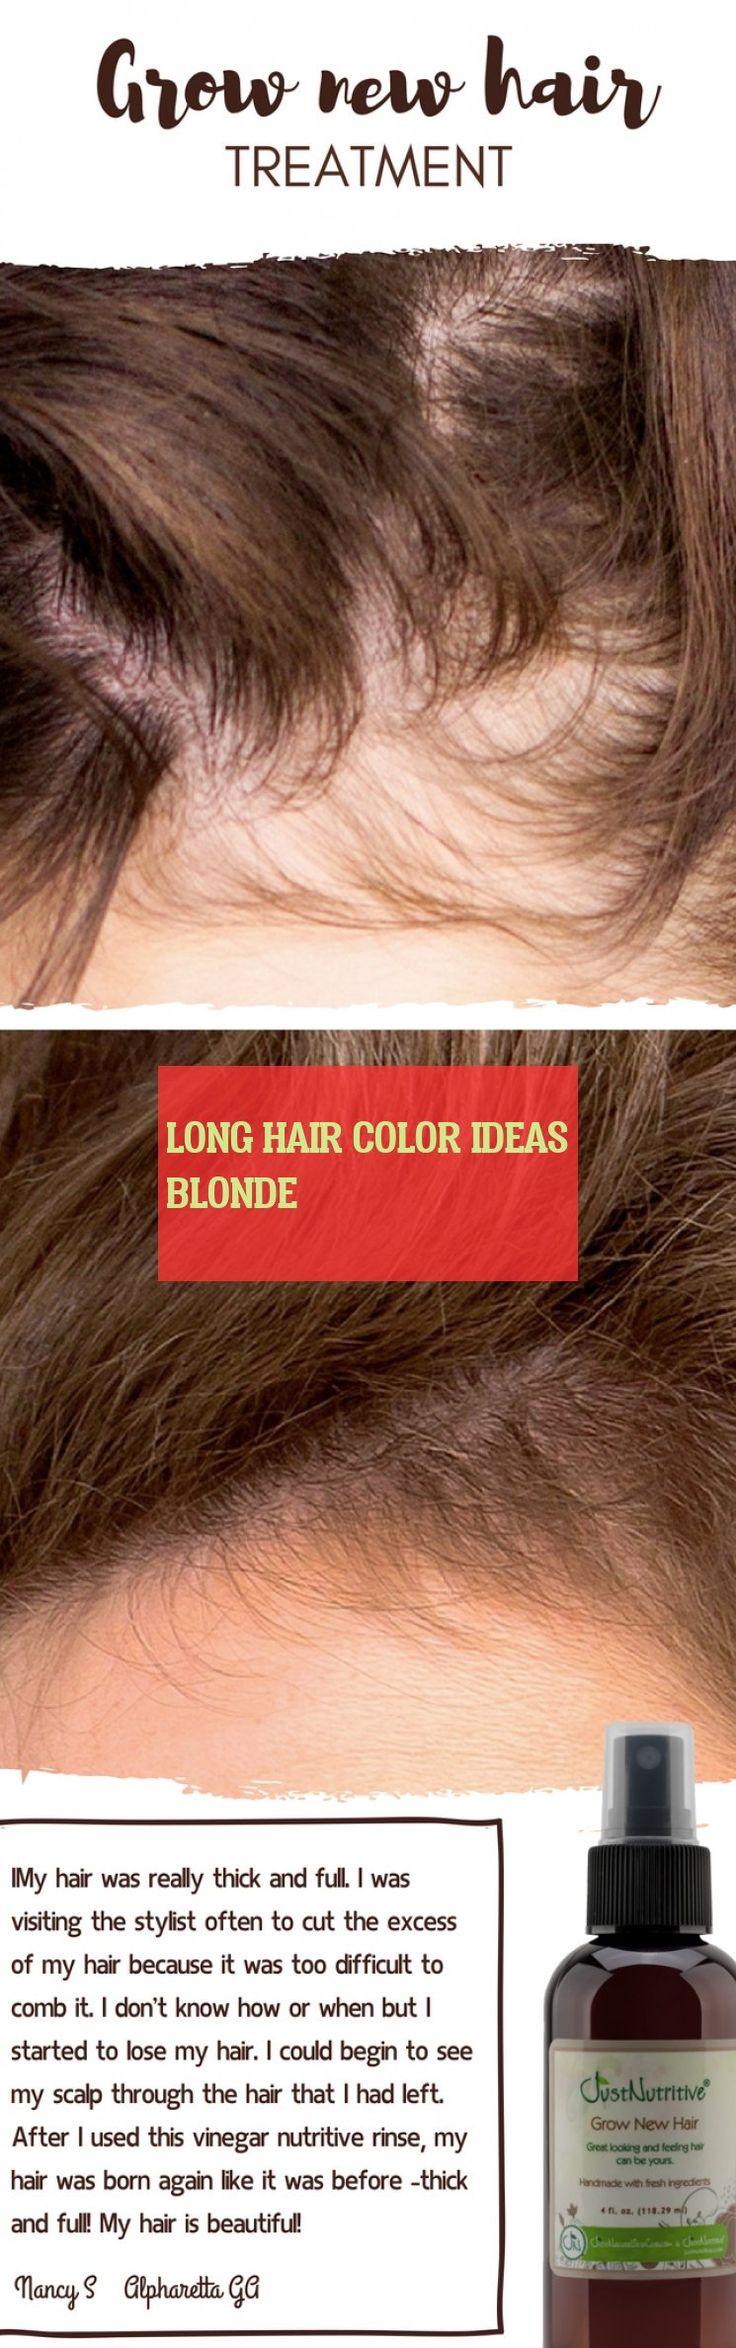 long hair color ideas blonde Long Hair lange haarfarbe ideen blond #long #hair #…